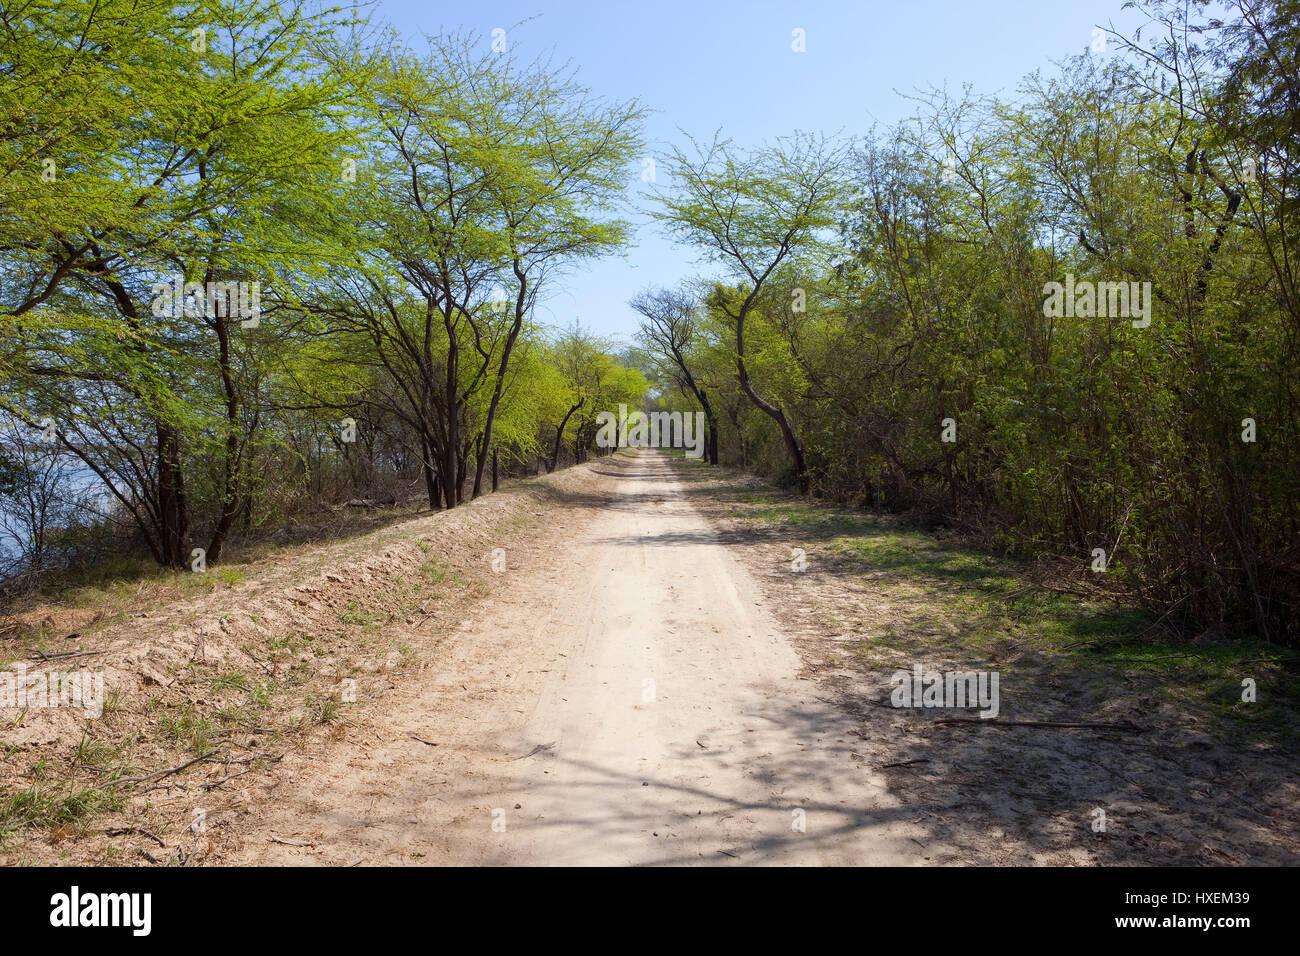 an acacia lined sandy road at harike wetlands punjab india under a blue sky - Stock Image